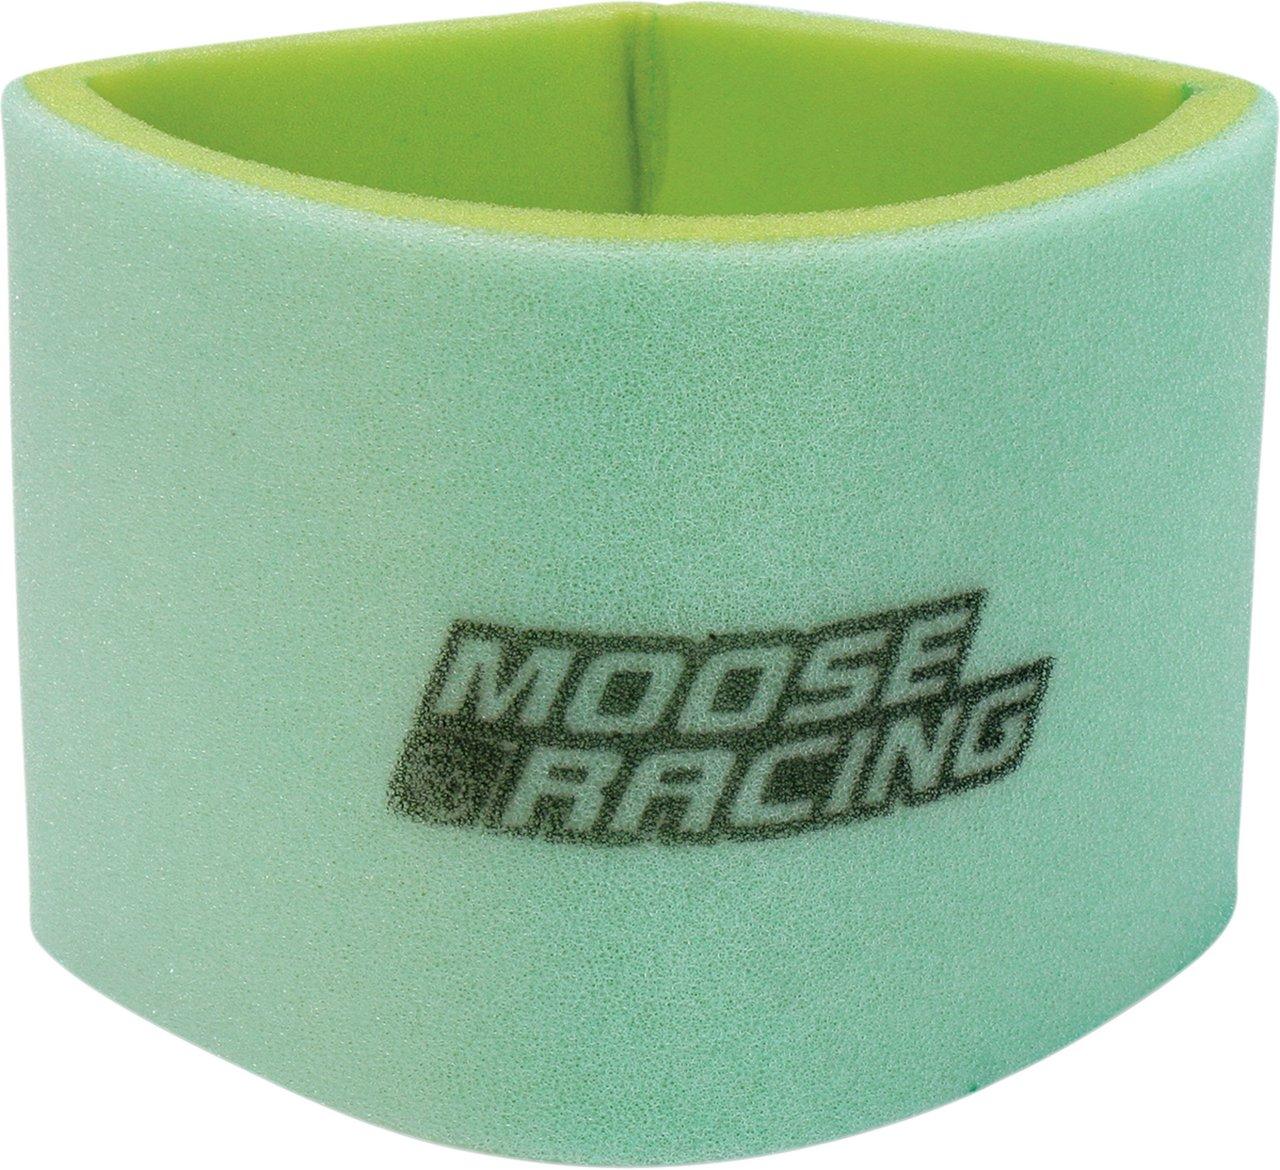 【MOOSE RACING】PPO (PRECISION PRE-OILED) 空氣濾芯 [1011-1137] - 「Webike-摩托百貨」